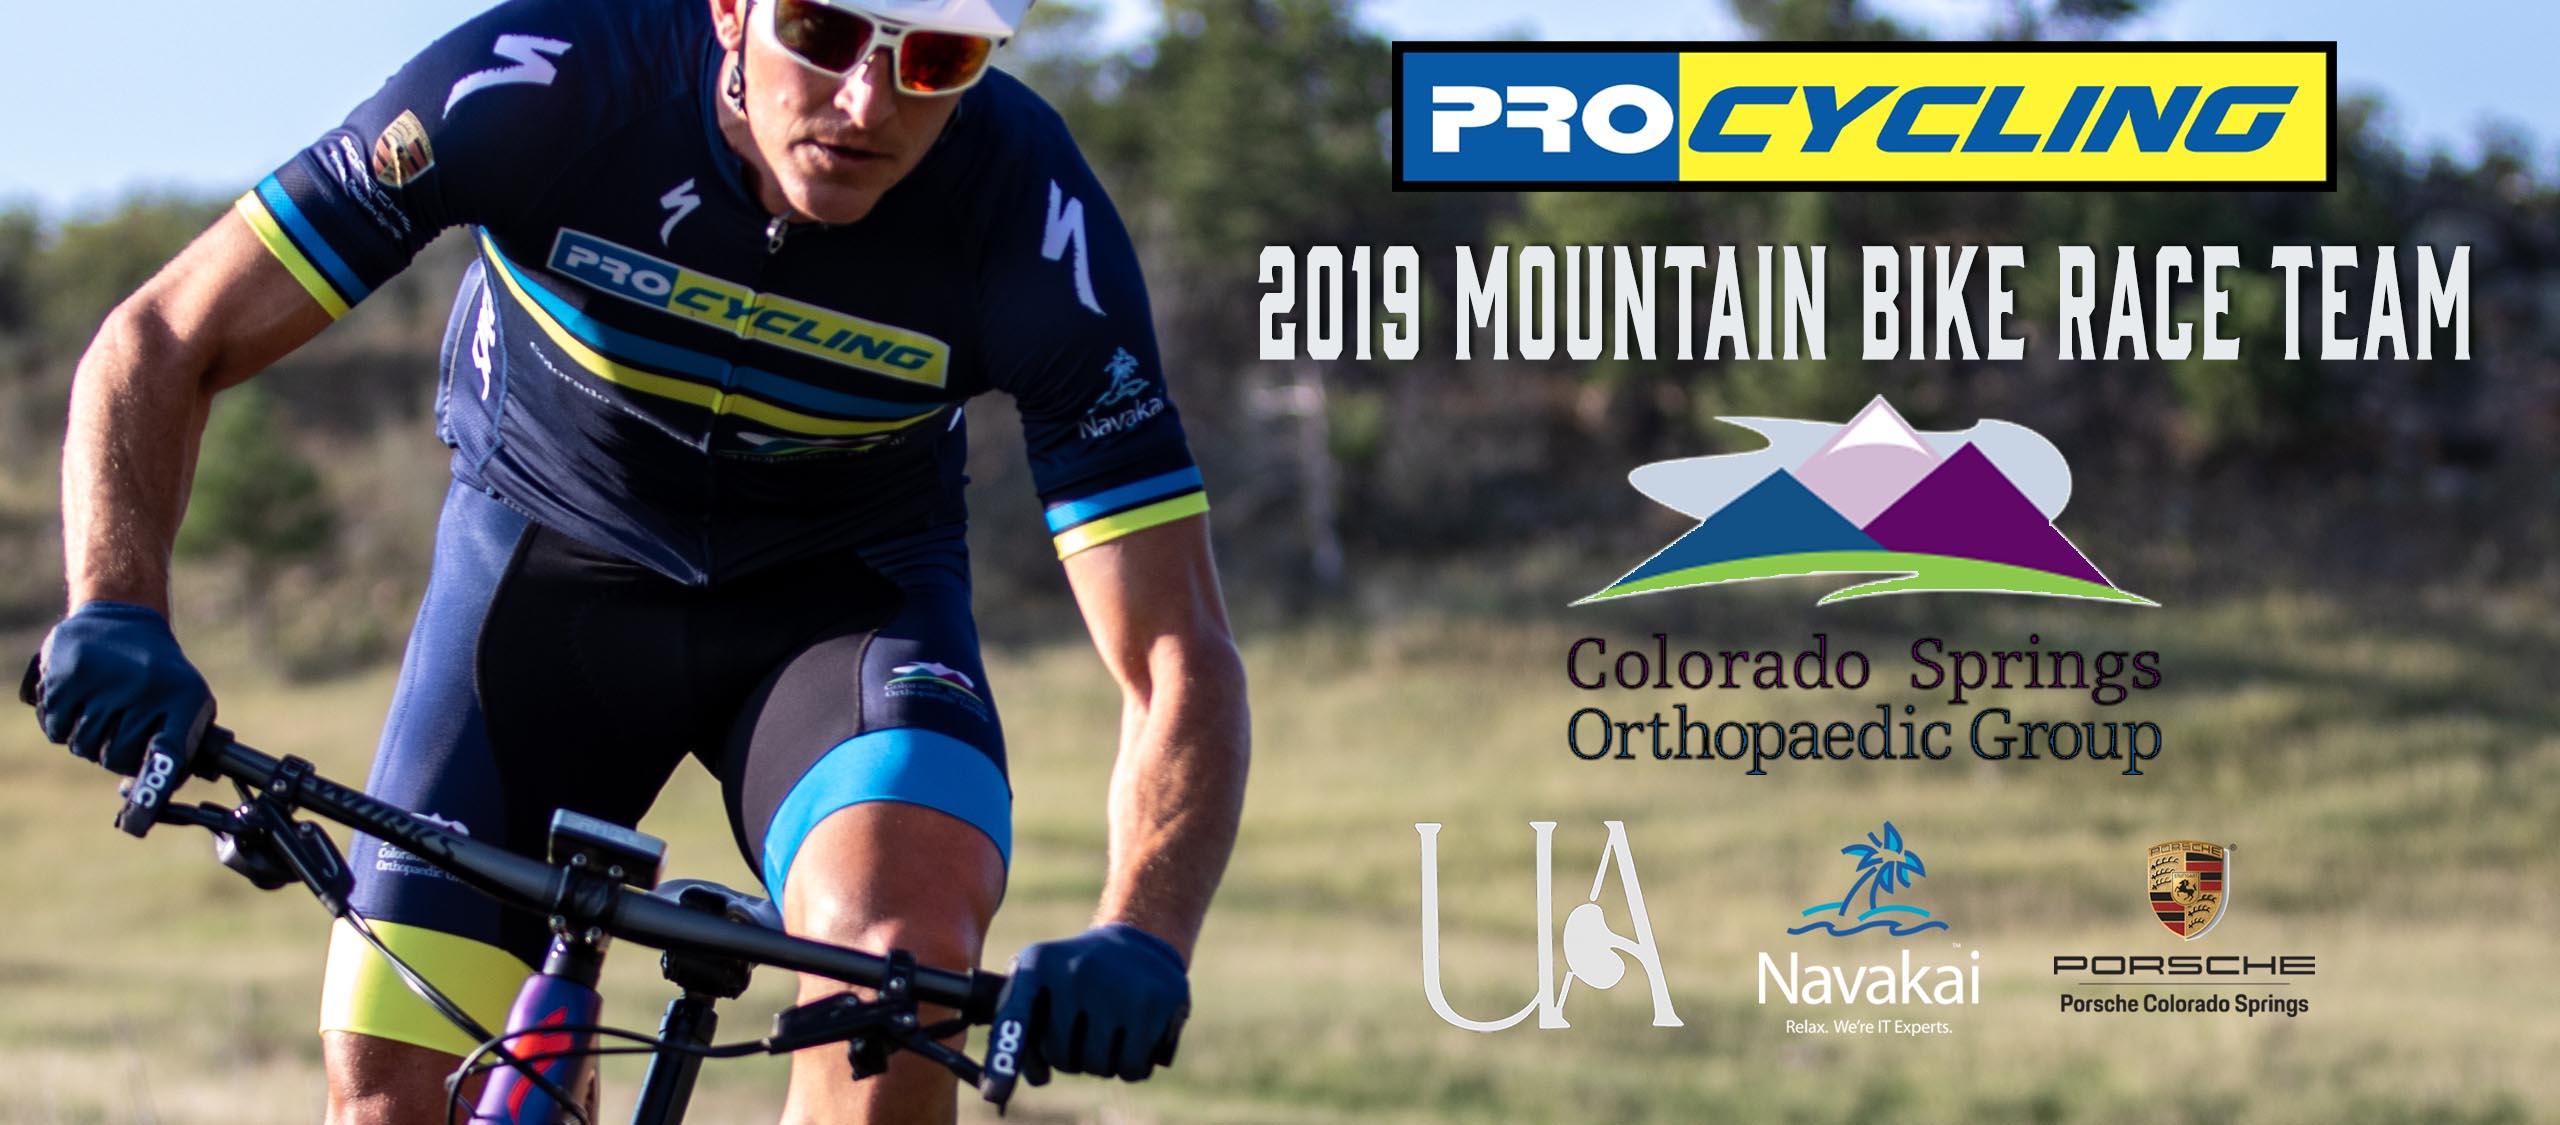 ProCycling 2019 Mountain Bike Race Team - sponsors